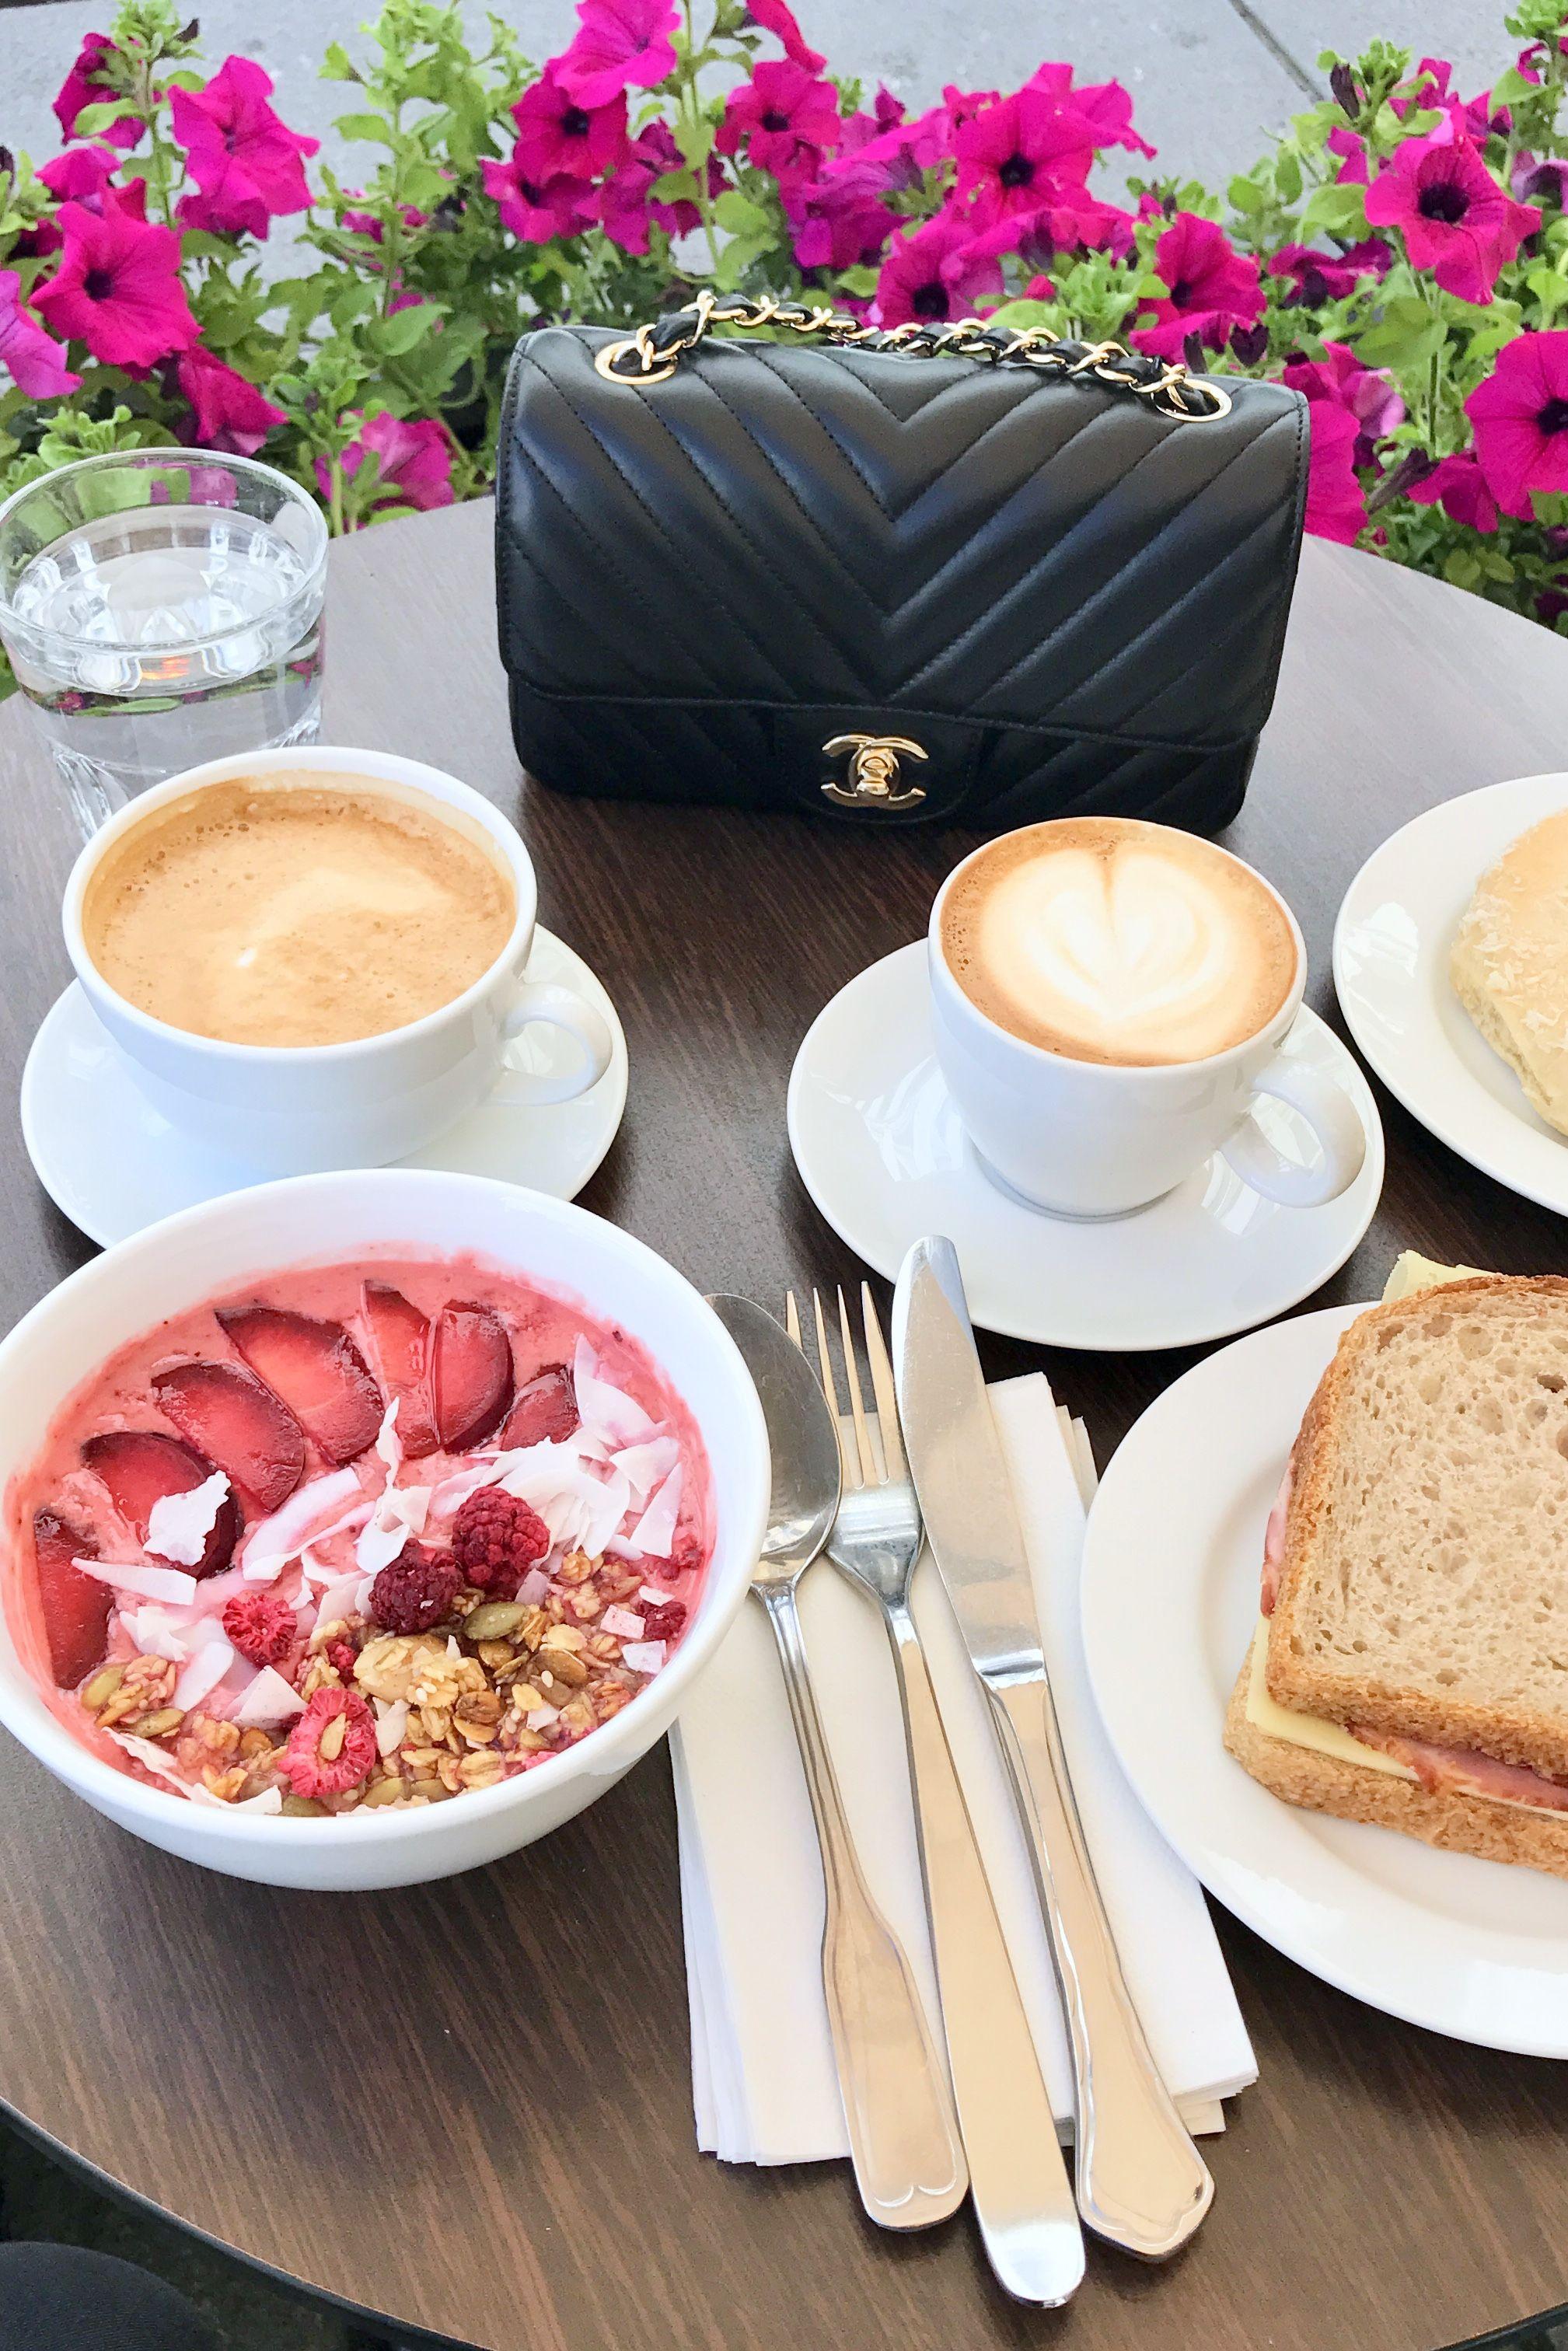 edcf26d5 Chanel rectangular mini, Chanel chevron flap bag. Acai bowl, sandwich,  coffee, cappuccino, caffe latte, lunch time. pursesandpugs